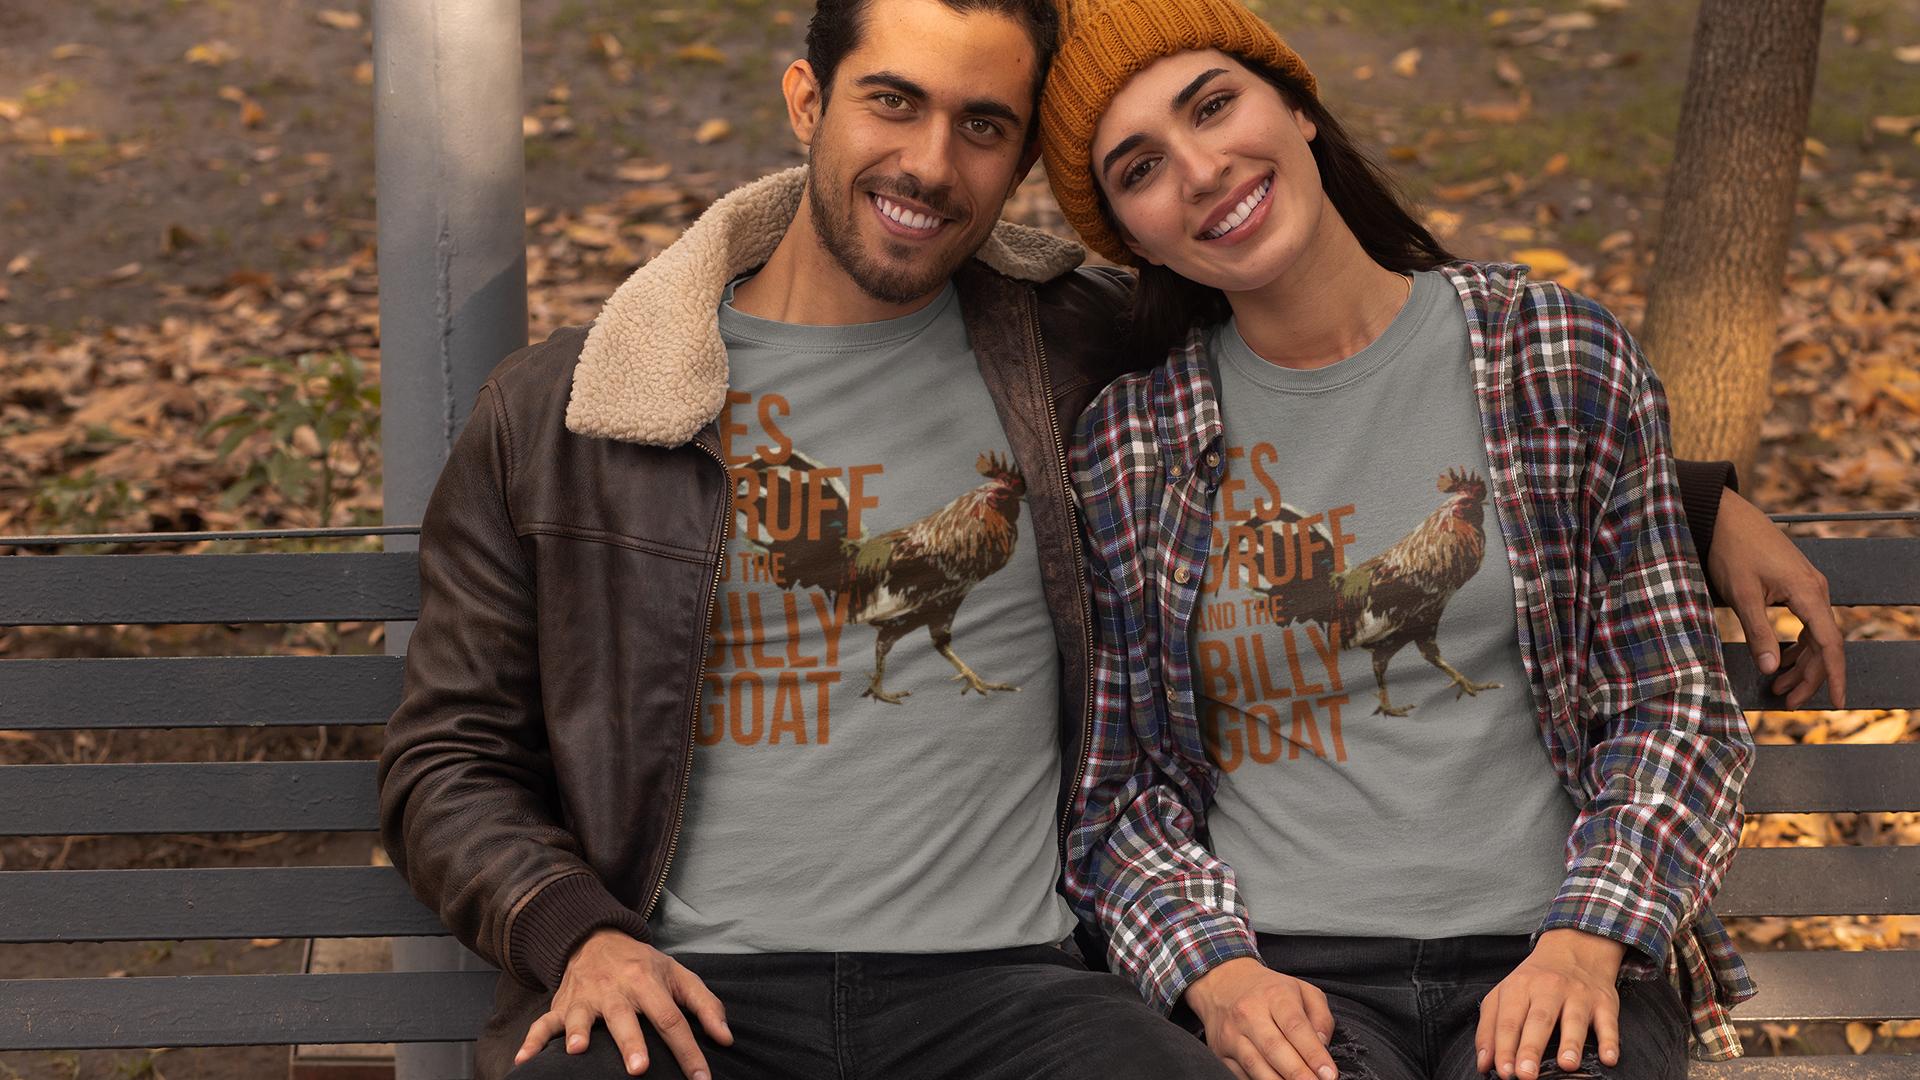 Les Gruff T-Shirt